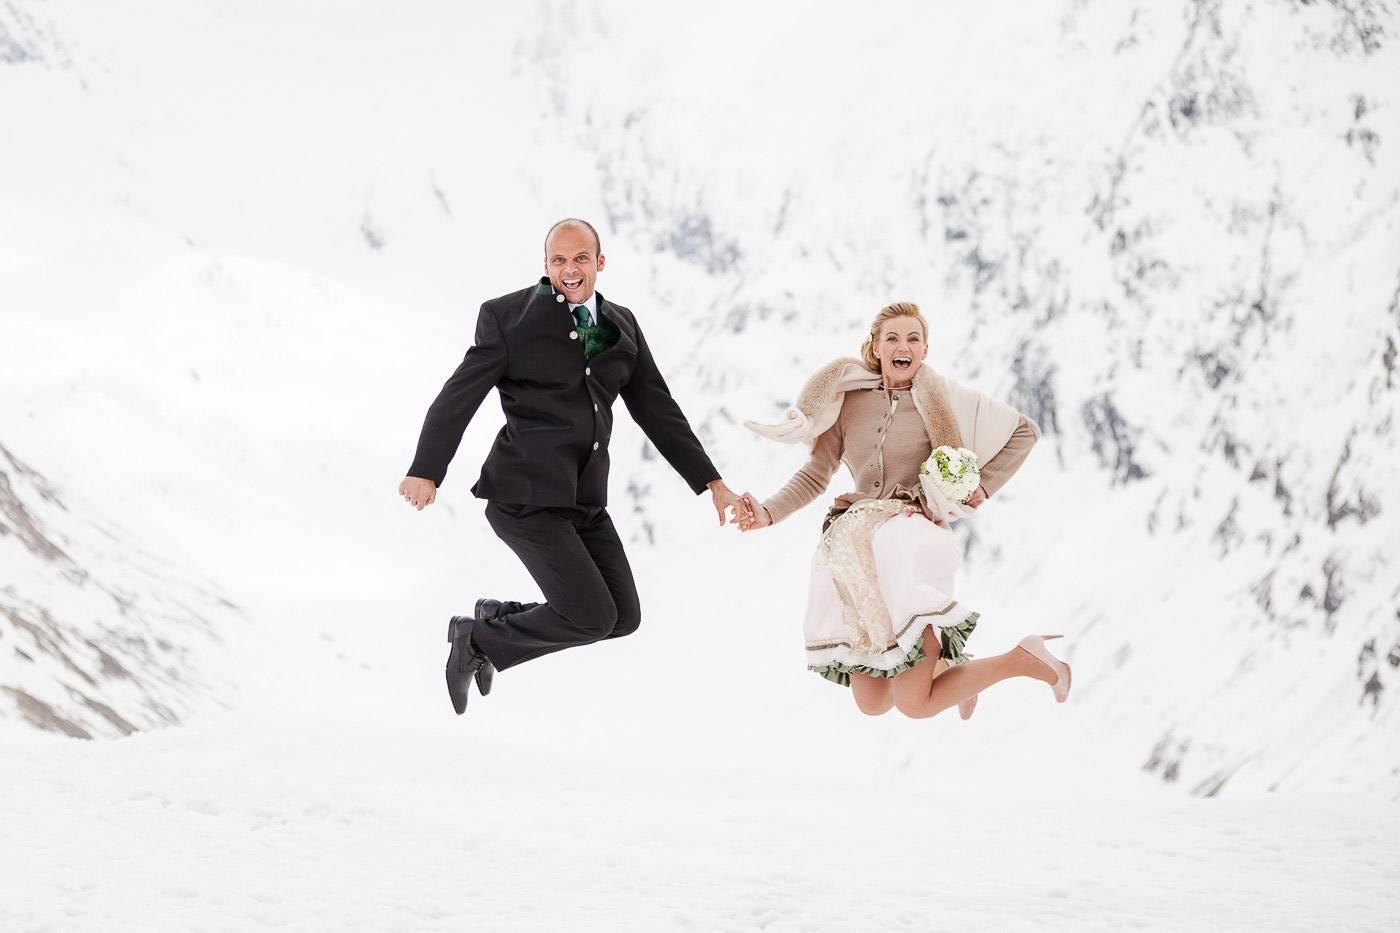 aschenputtel-hochzeitsfotograf-winterhochzeit-hohe-mut-alm-obergurgl-tirol